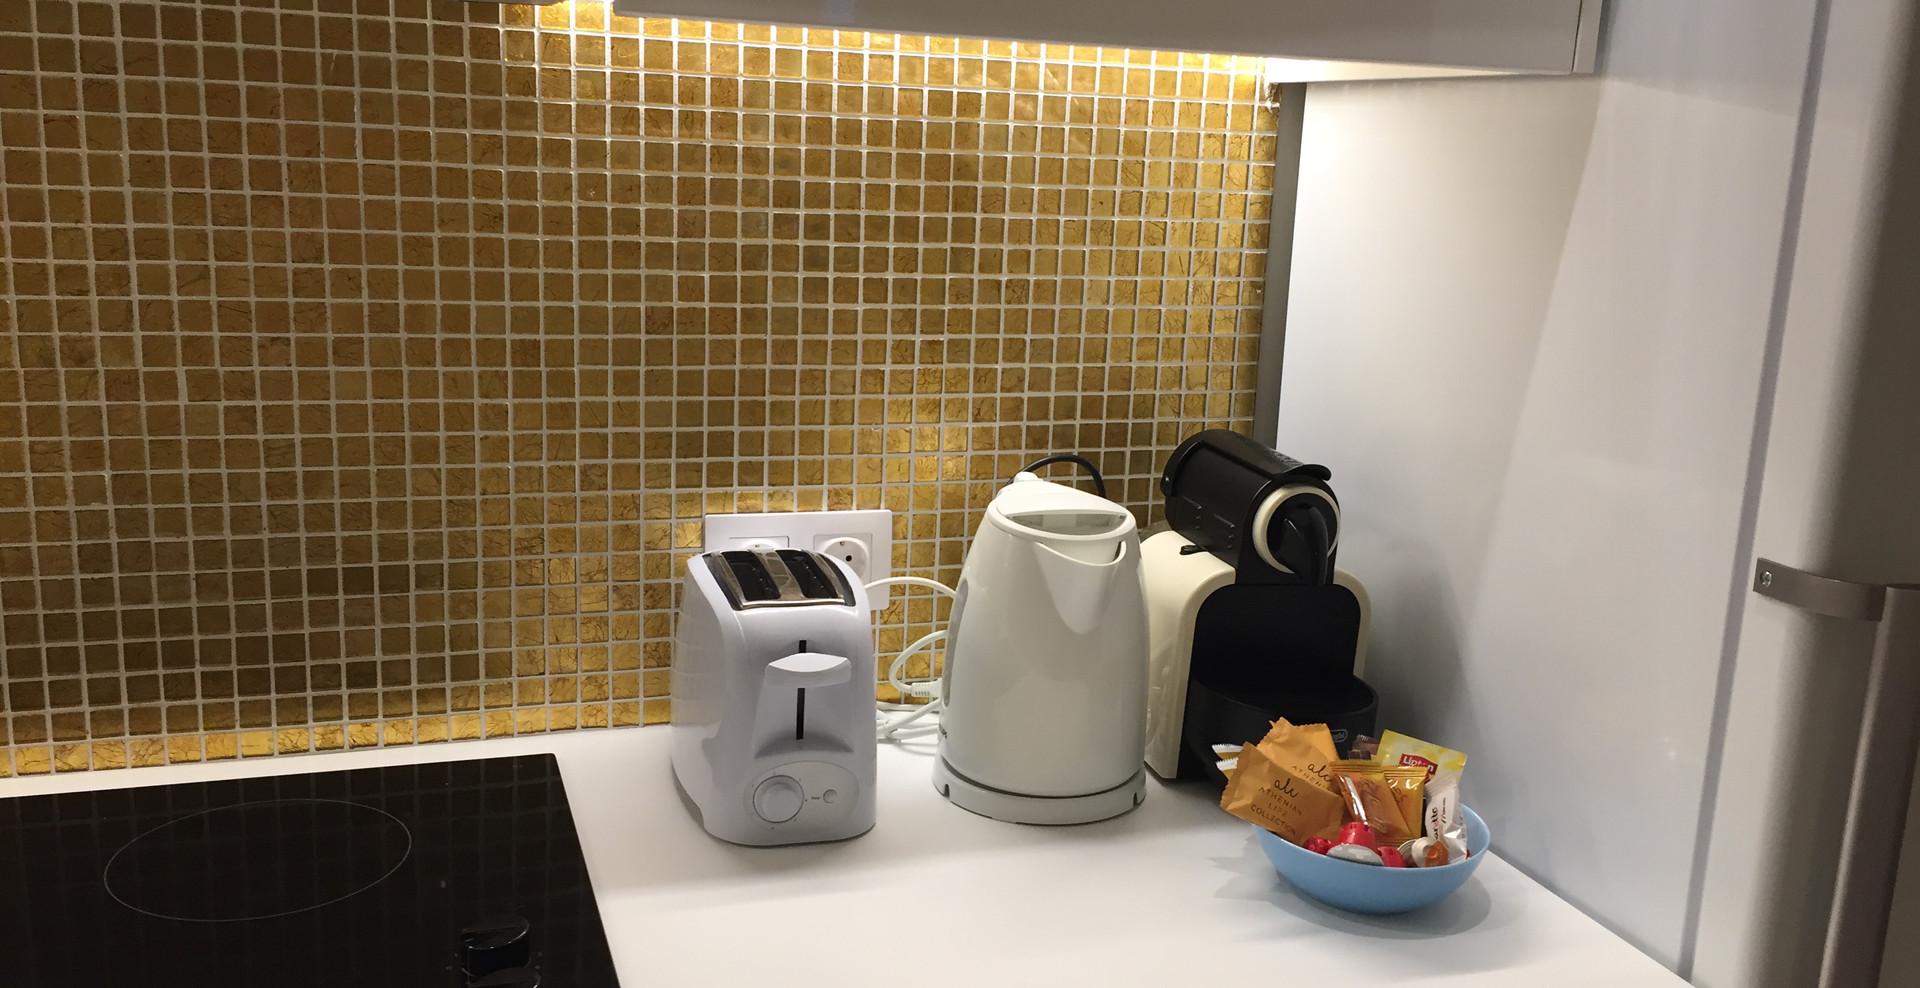 Toaster, kettle and Nespresso machine